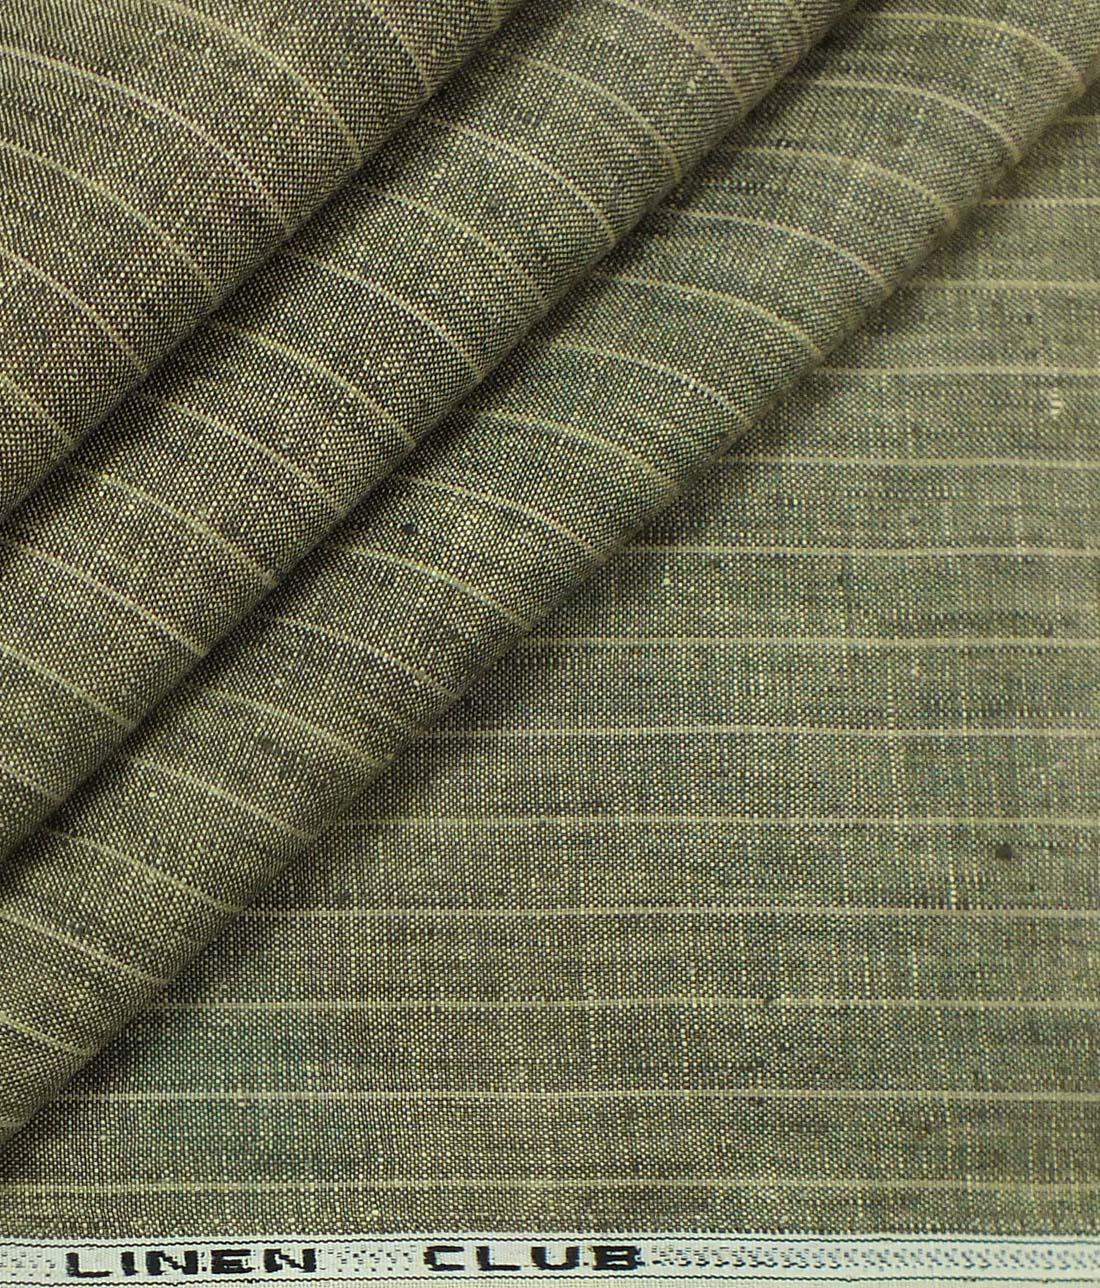 Linen Club By Aditya Birla Group Brown 100 Linen Striped